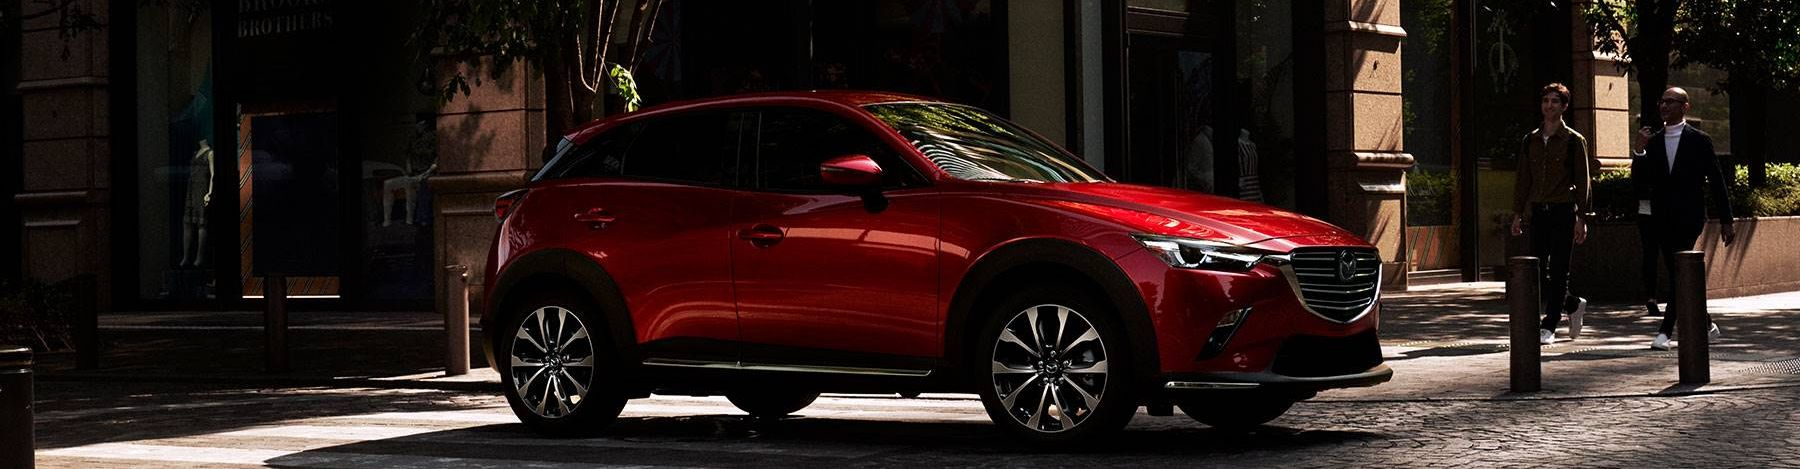 2019 Mazda CX-3 Leasing near Ann Arbor, MI